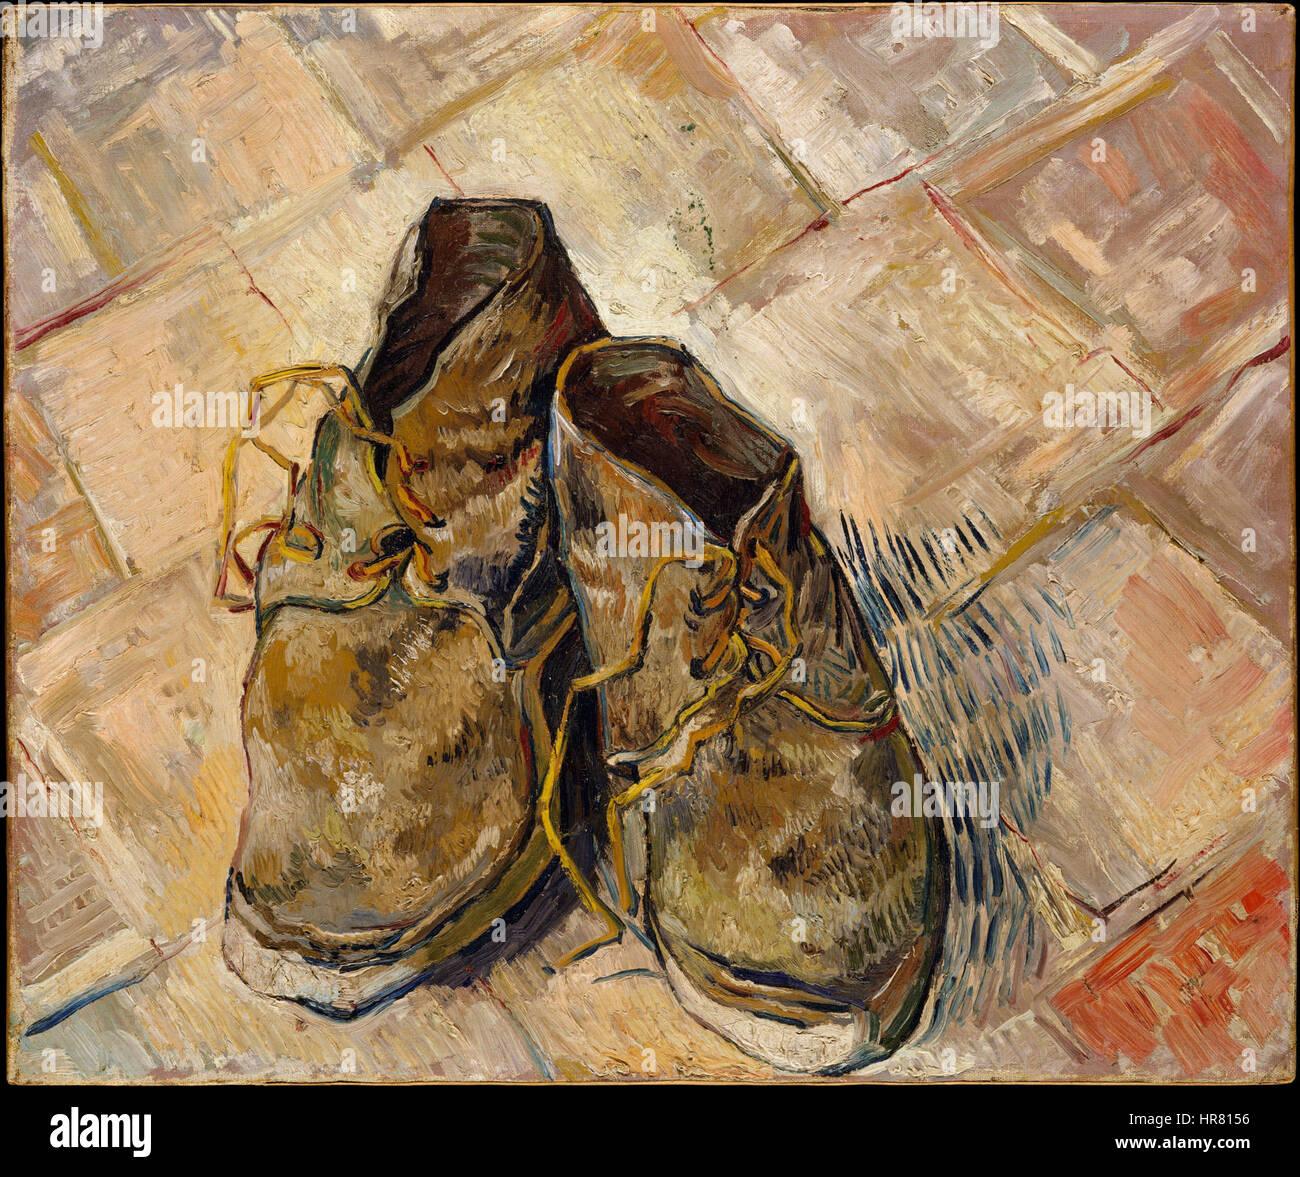 Alamy Gogh Schuhe StockfotoBild134786210 Van Vincent kuPZiX